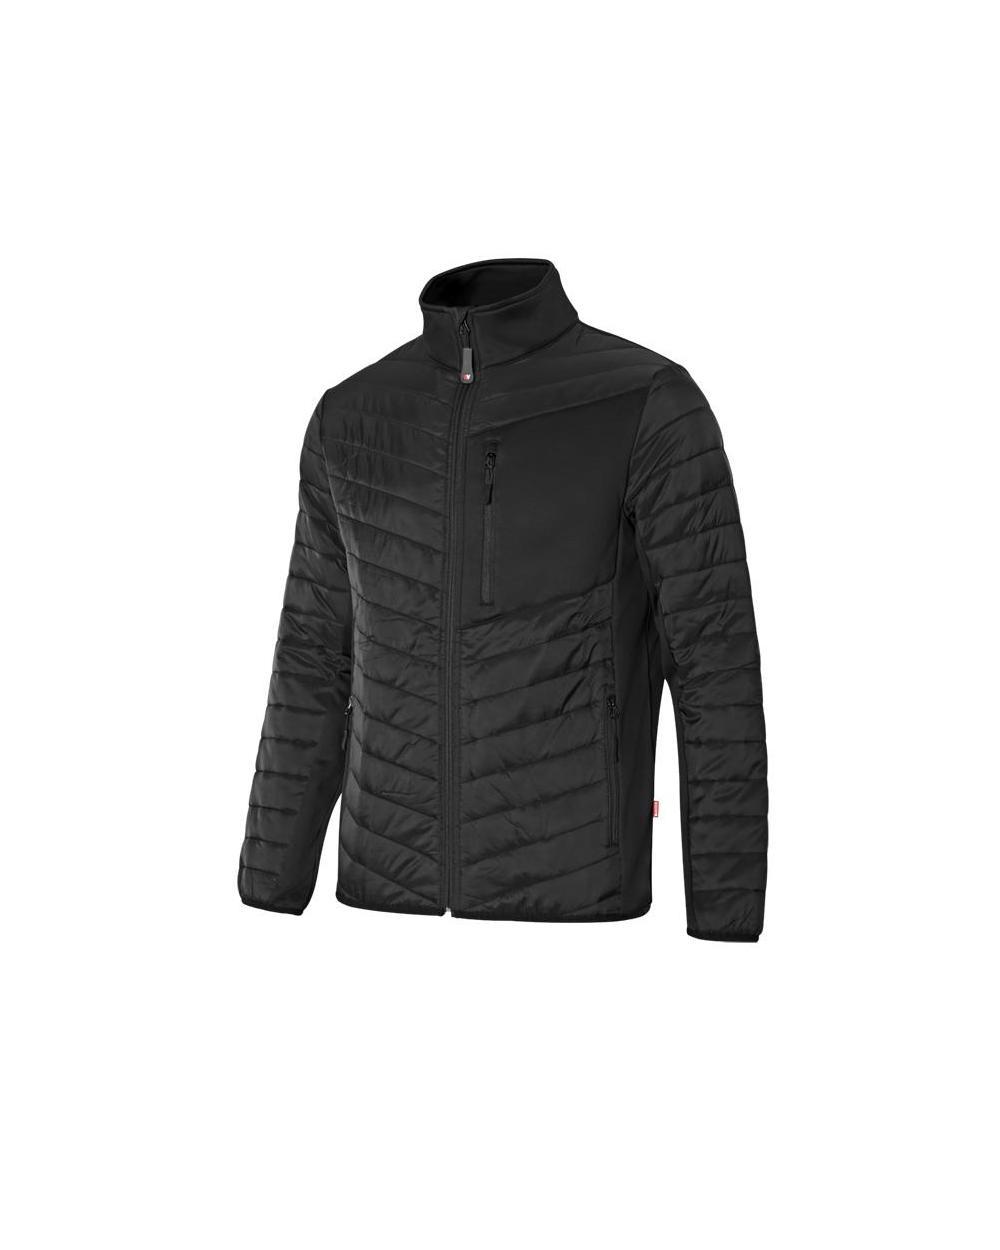 Comprar Chaqueta ligera acolchada serie 206009 online barato Negro/Negro